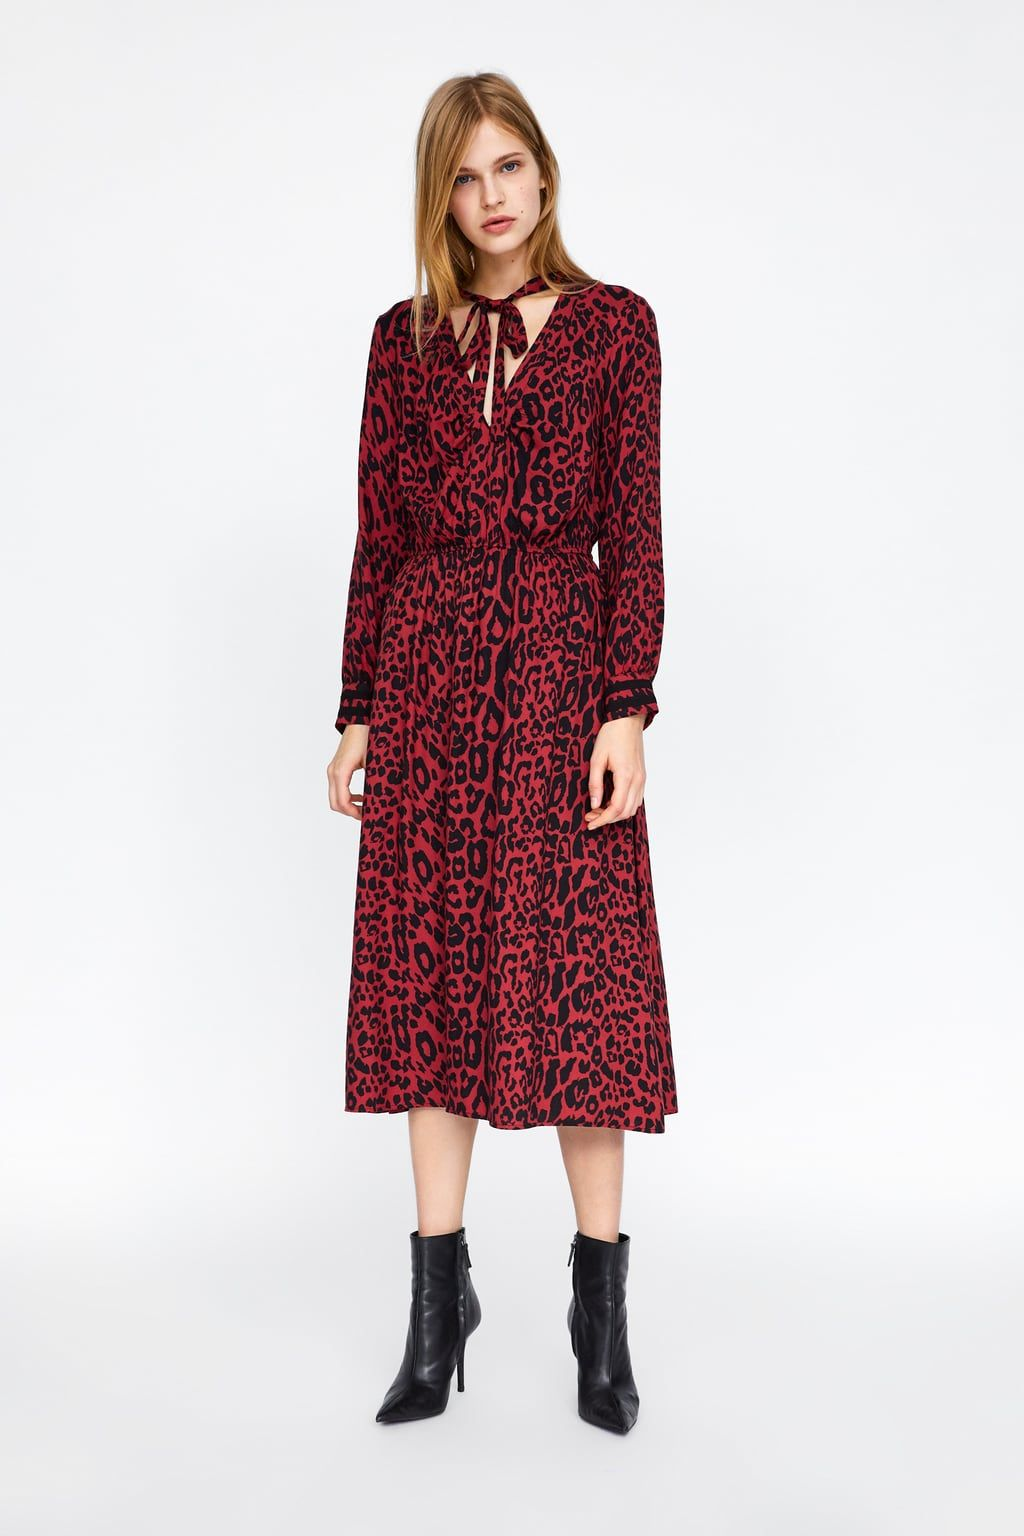 Animal Print Dress In 2019 Animal Print Dresses Dresses